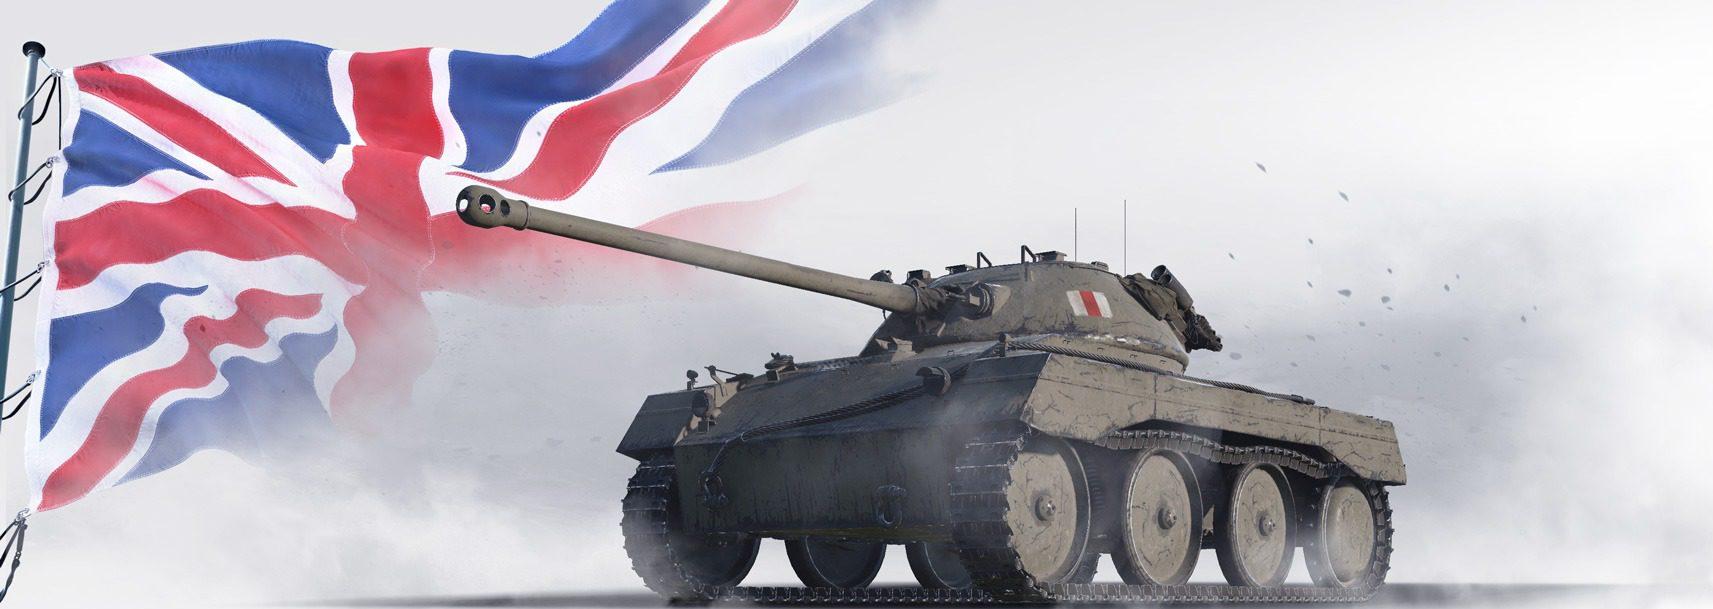 WoT_Template_New-Tank_A46_EN-e1584105548194